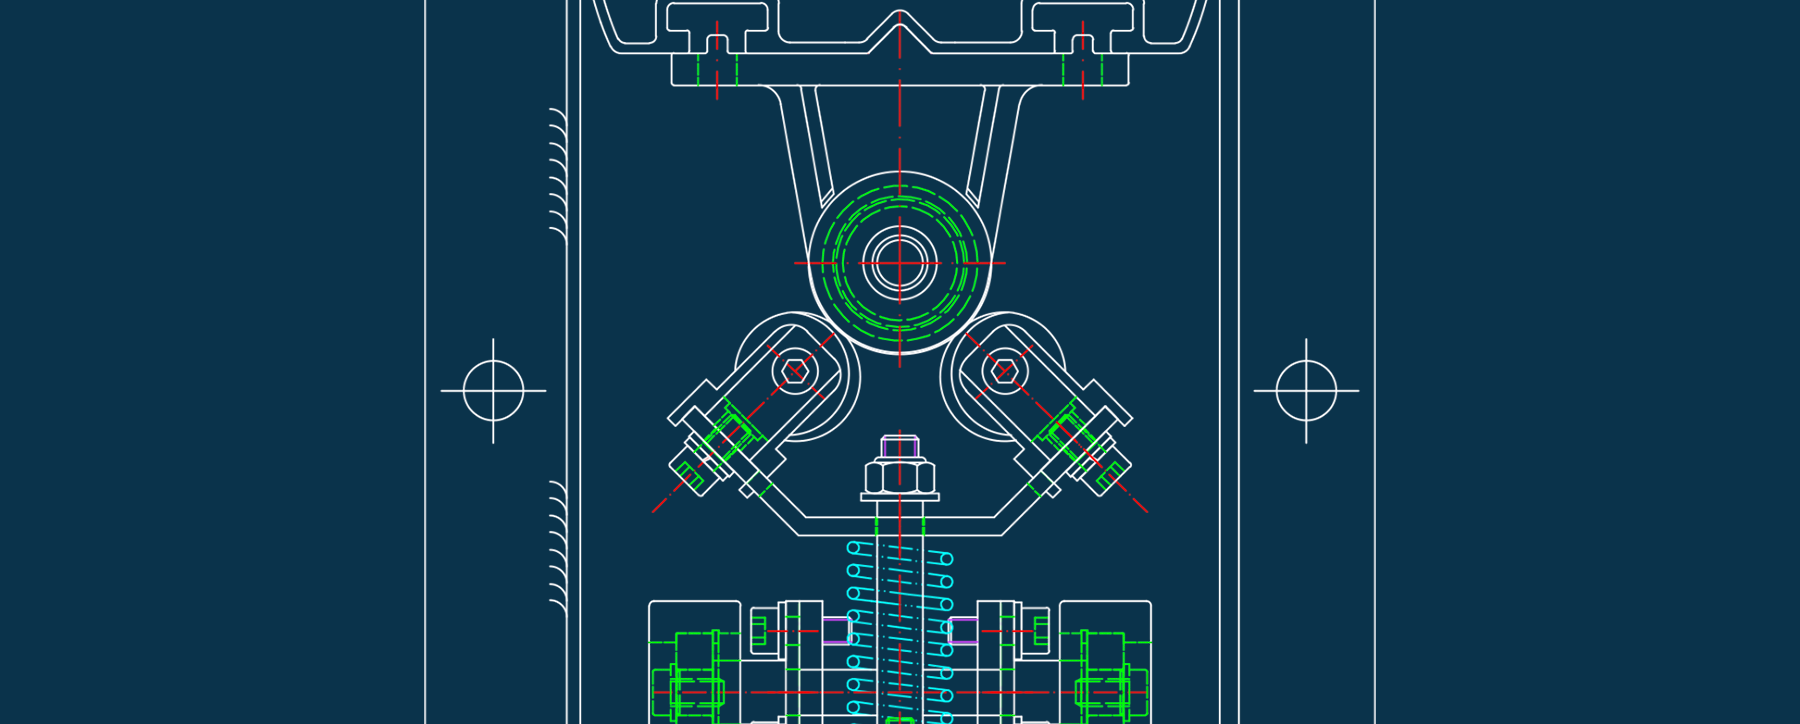 Overhead Conveyor System schematics